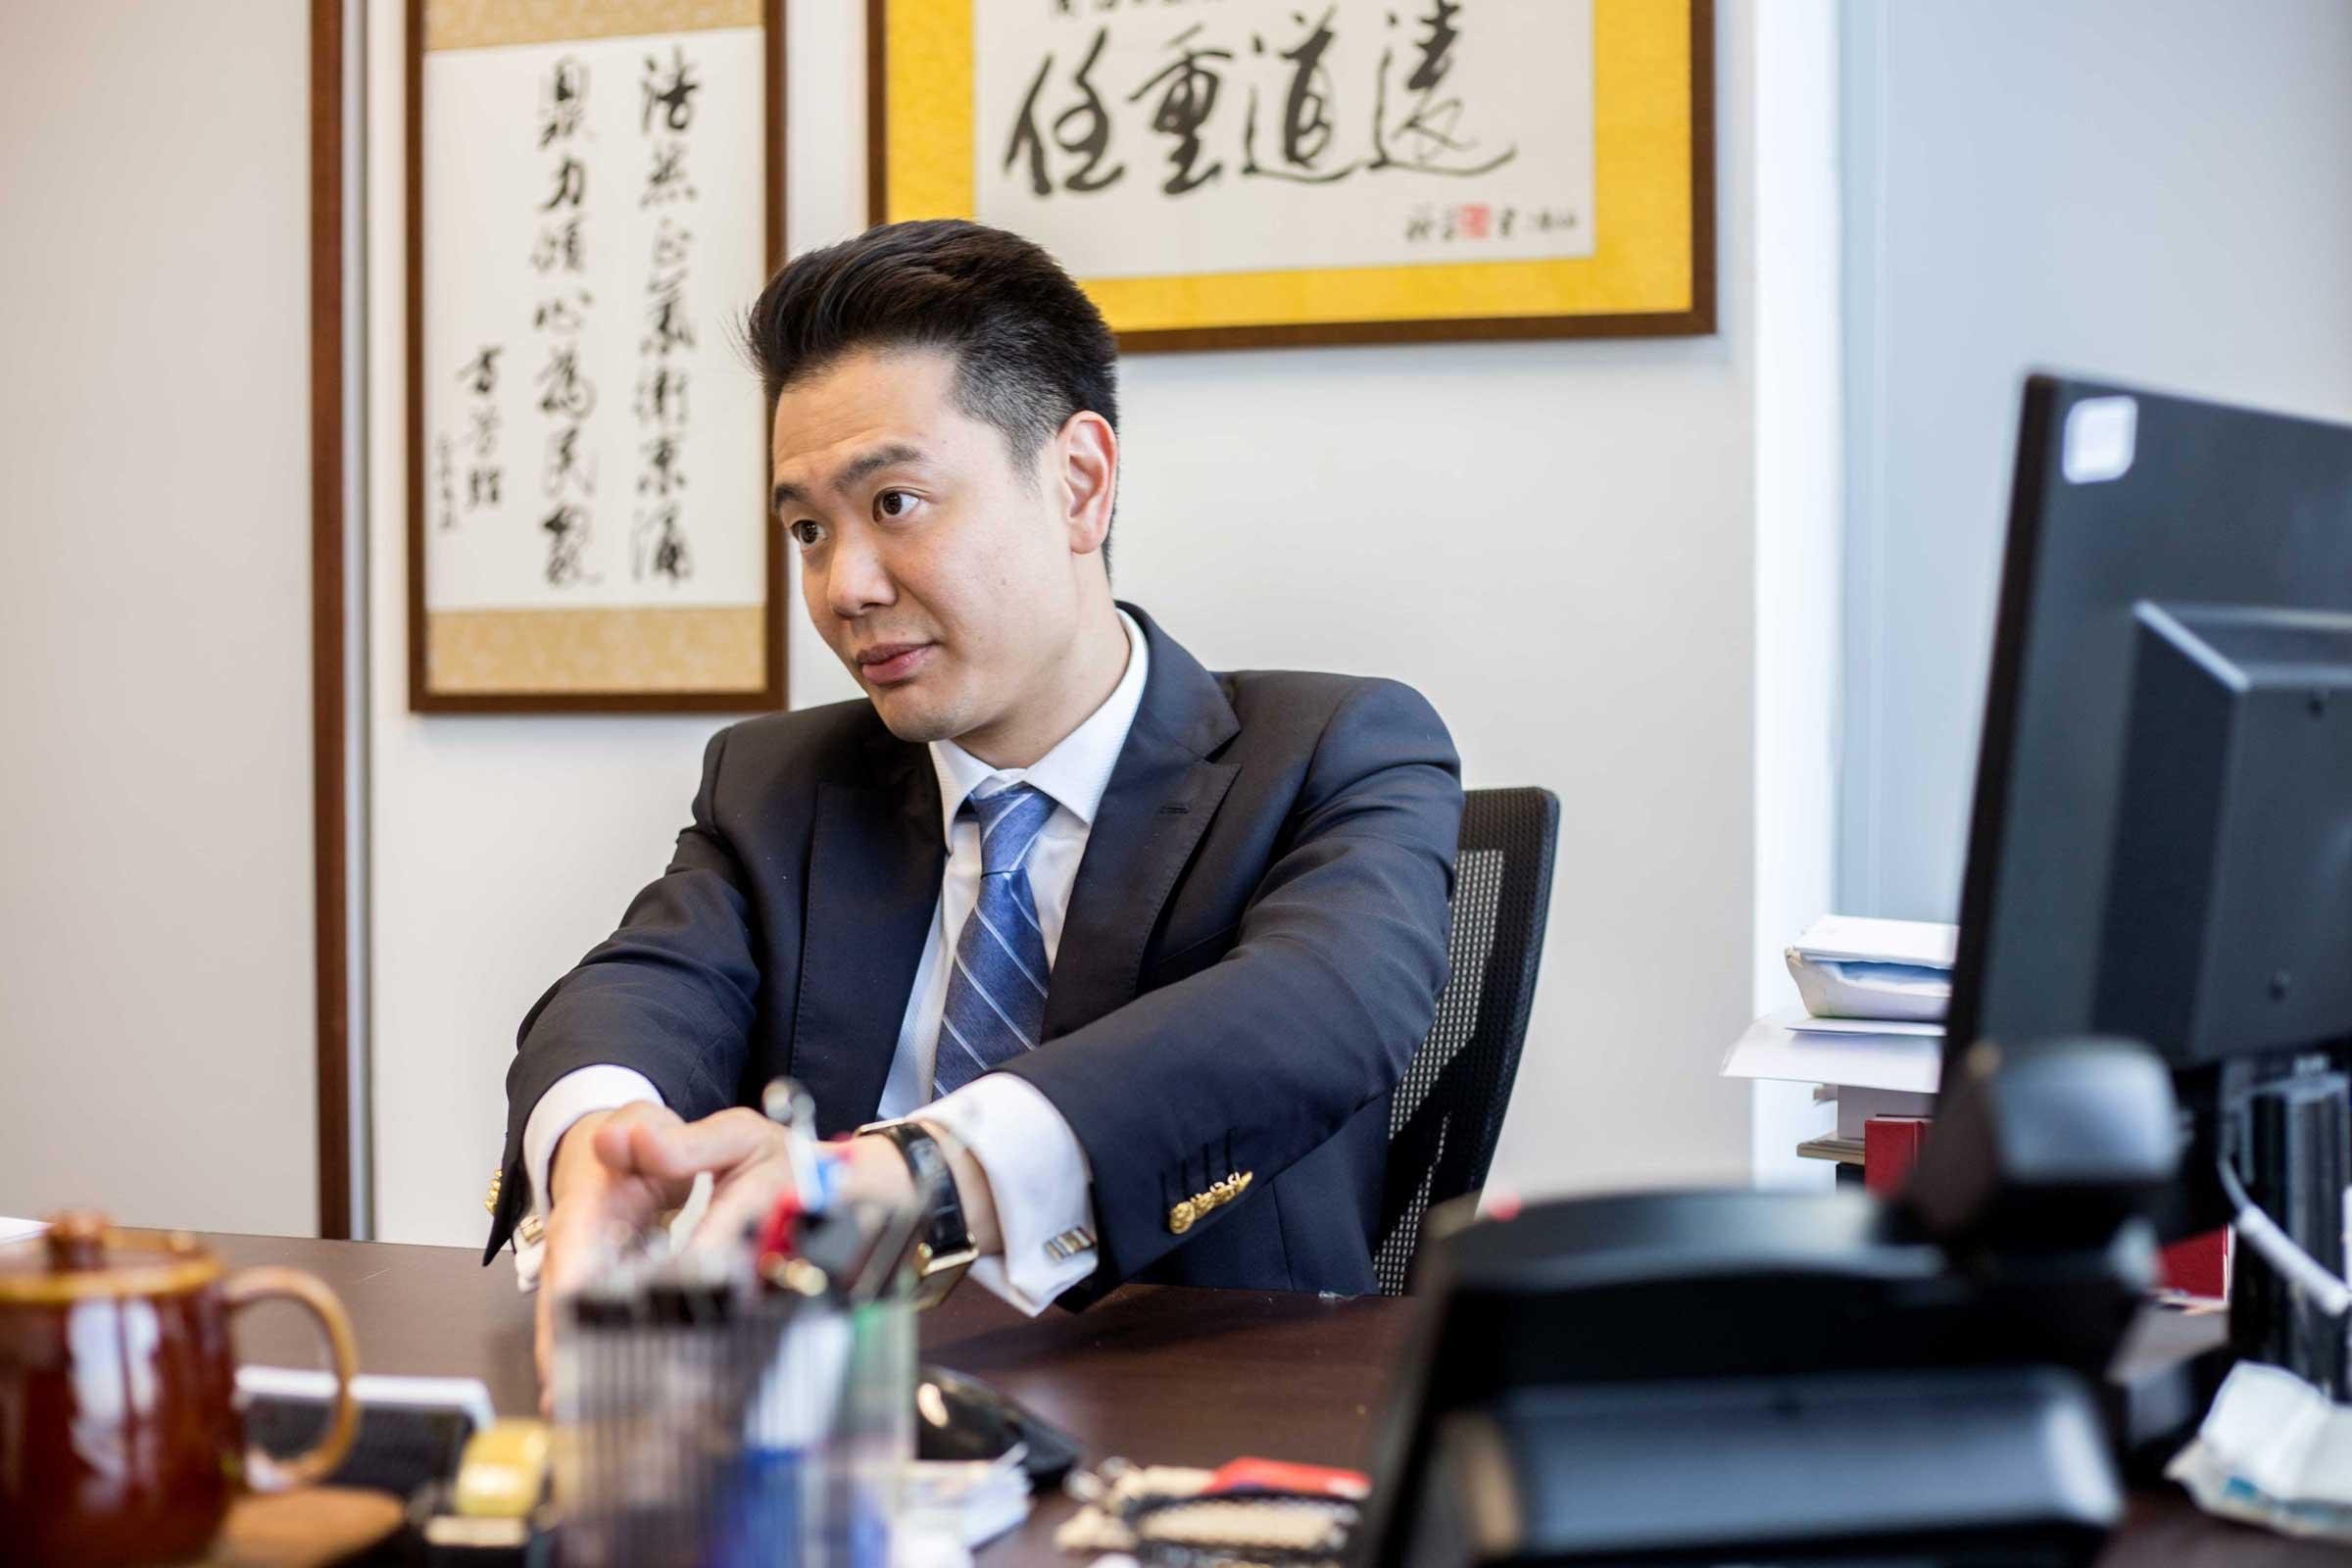 Al Jazeera   Jail in Hong Kong for booing China's national anthem  →